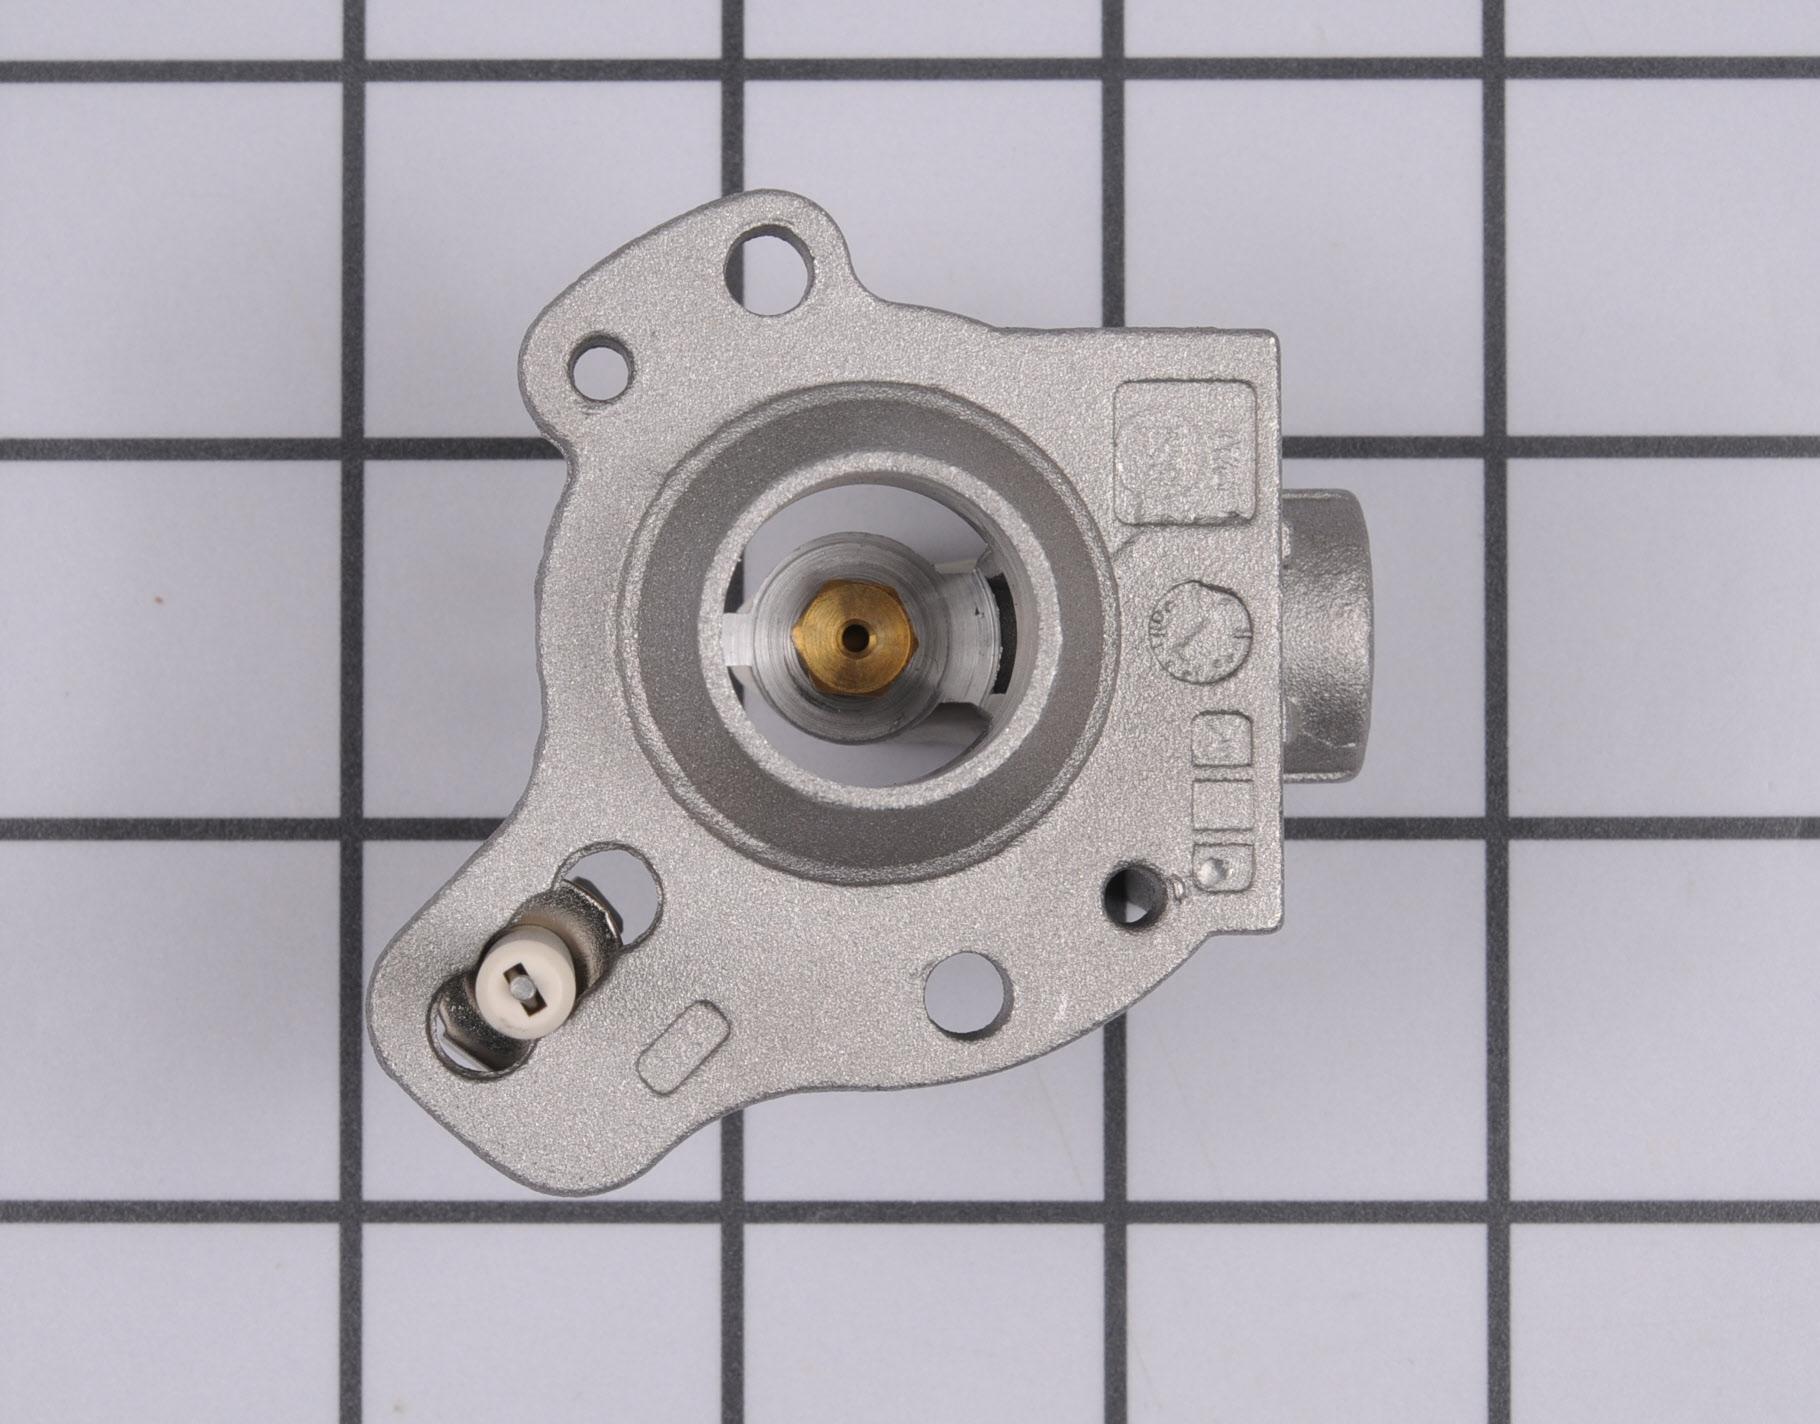 KitchenAid Range/Stove/Oven Part # WPW10128451 - Surface Burner Orifice Holder